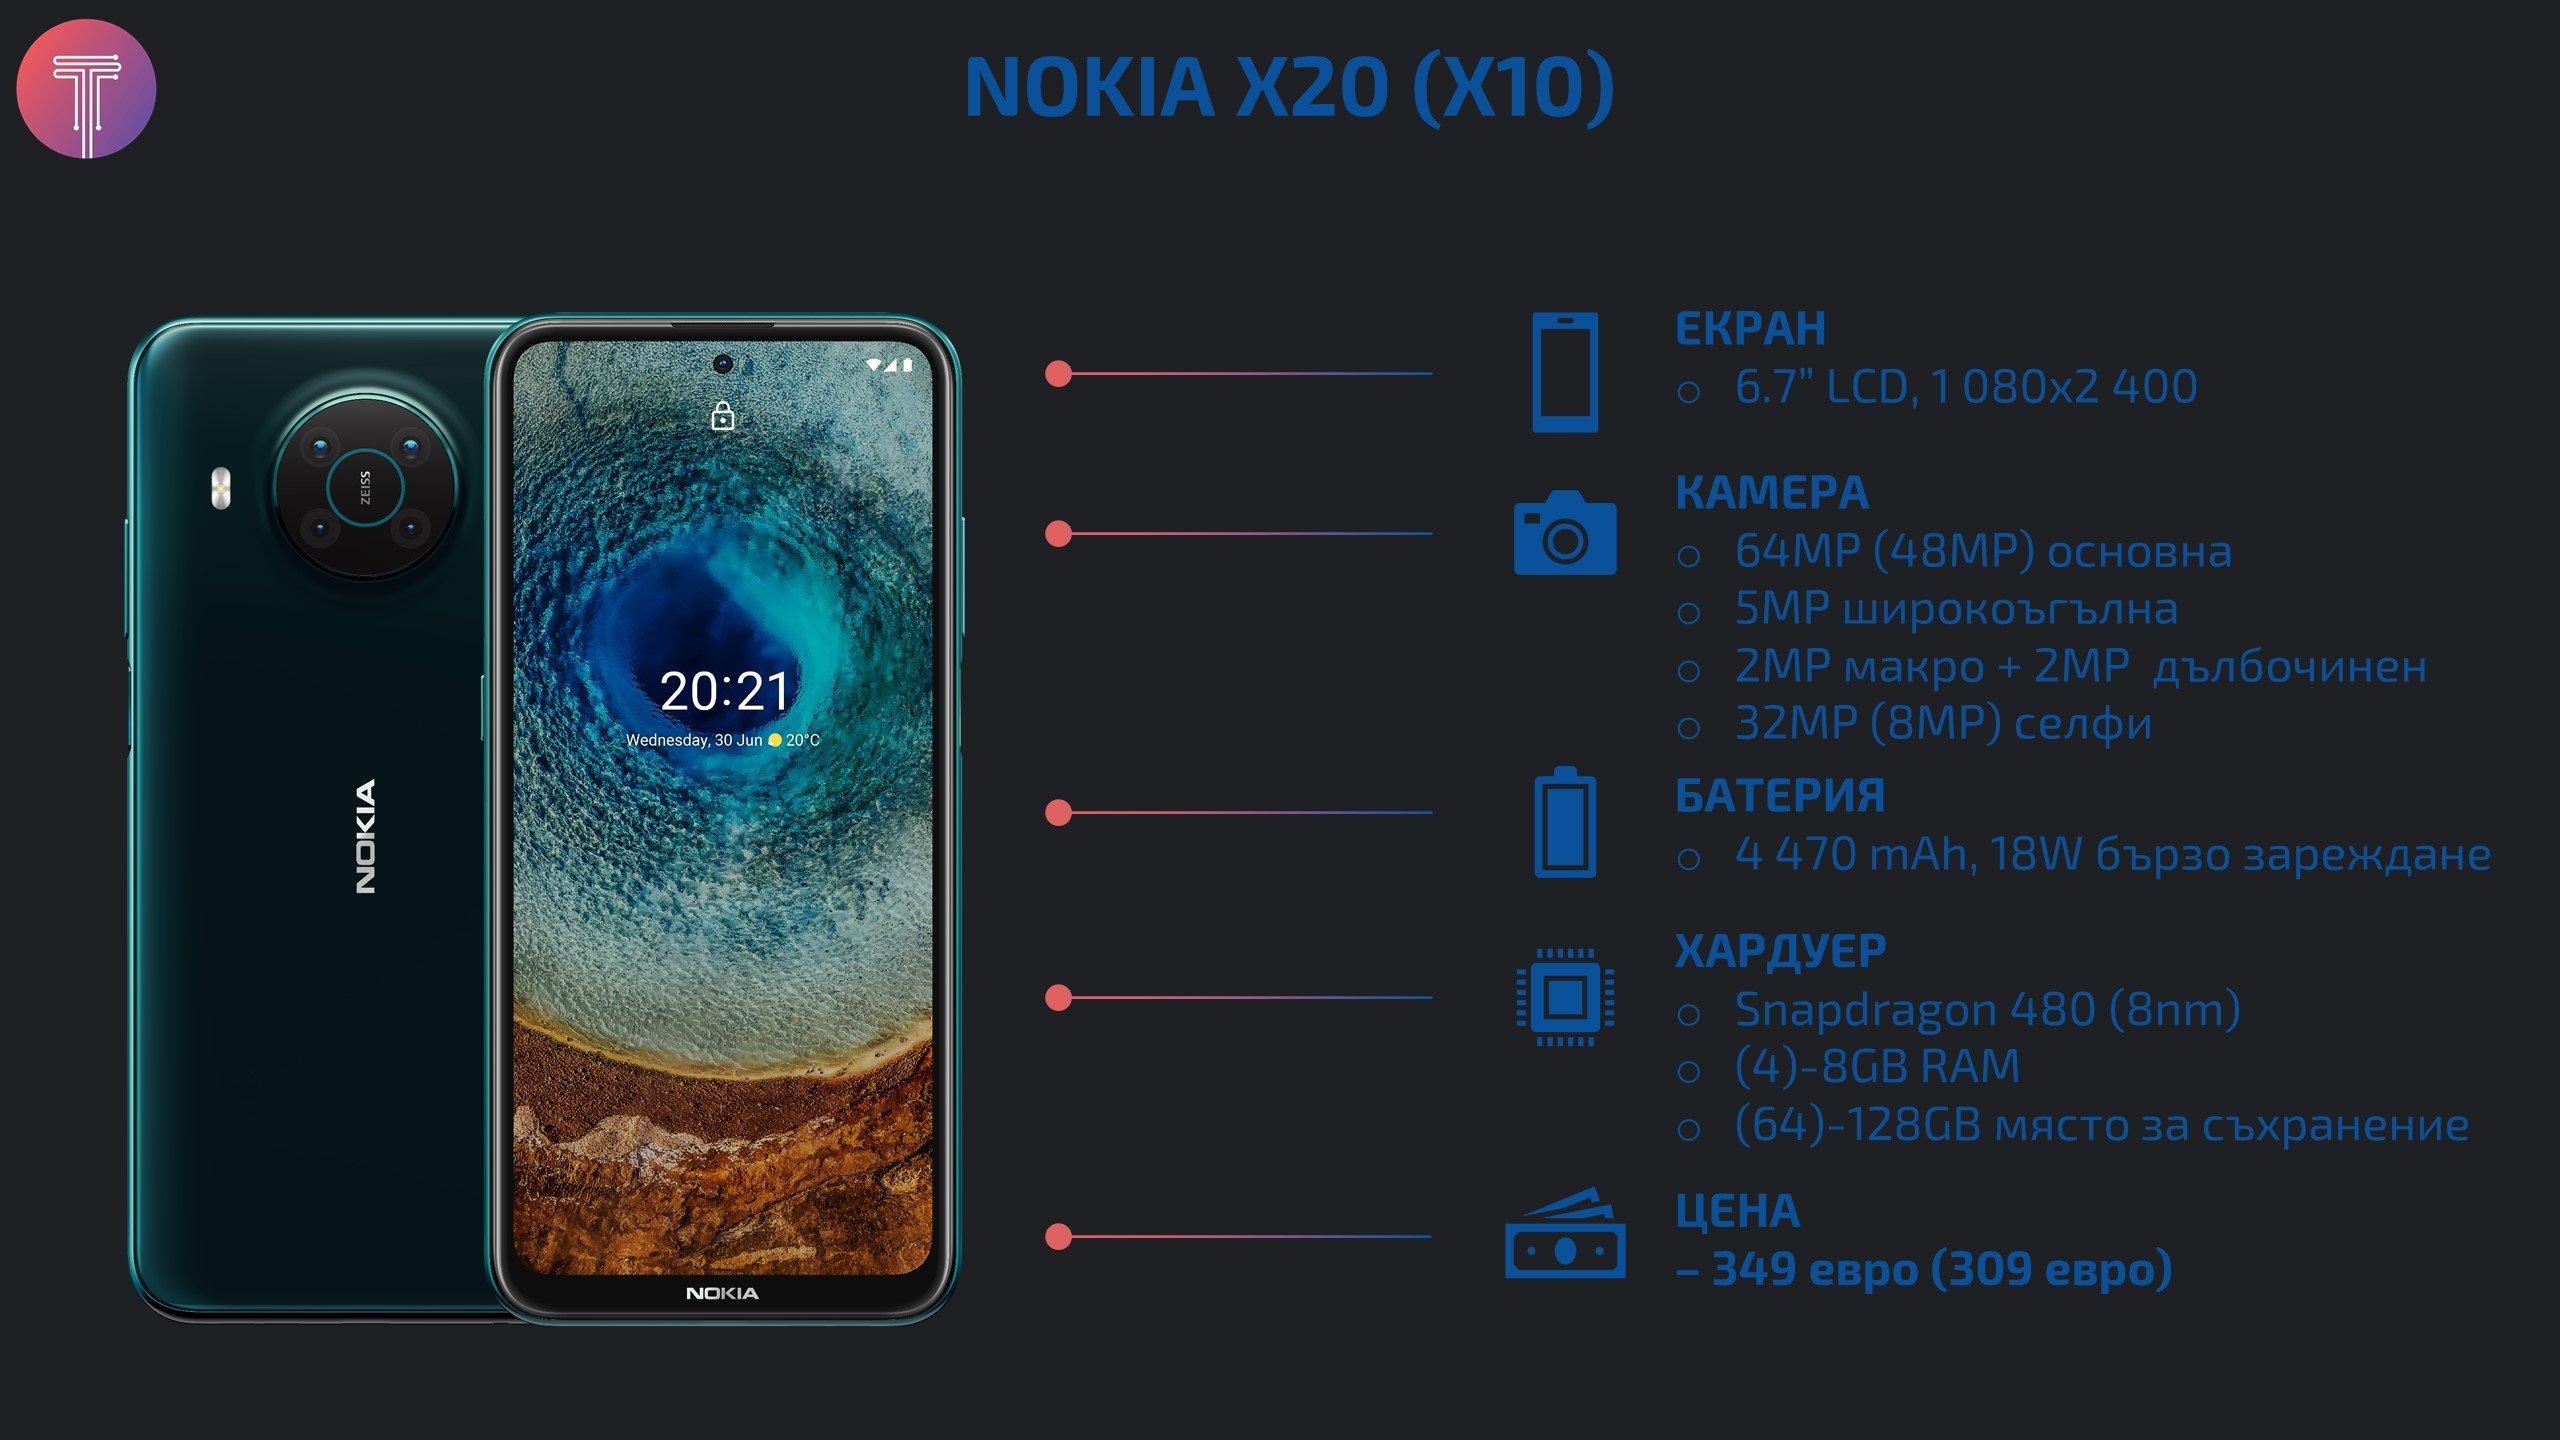 Nokia-X20-X10-Specs